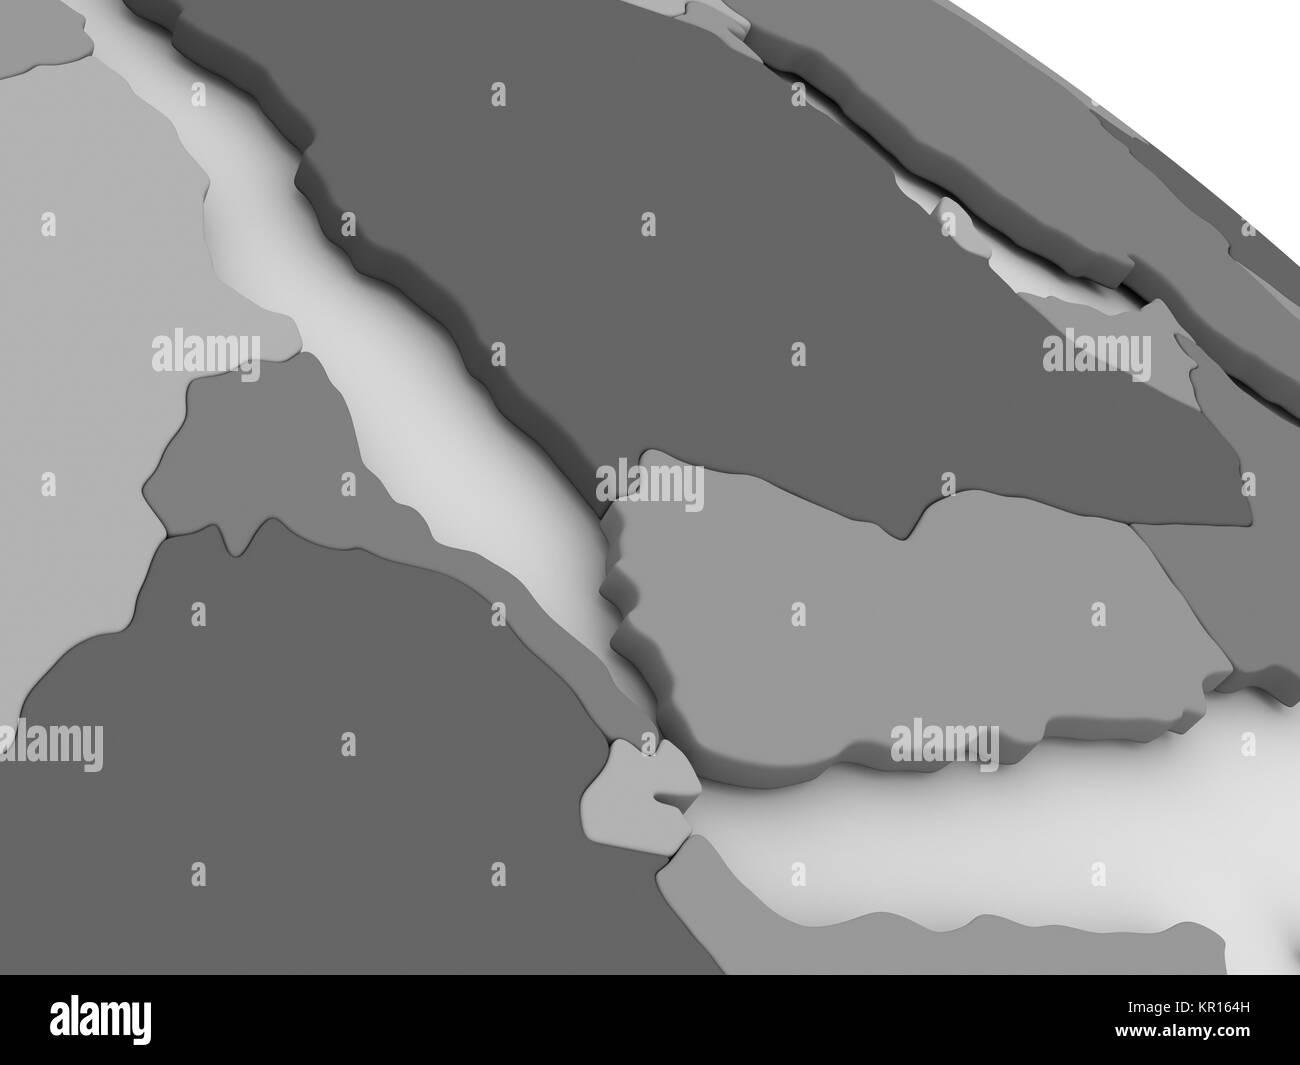 Yemen, Eritrea and Djibouti on grey 3D map - Stock Image